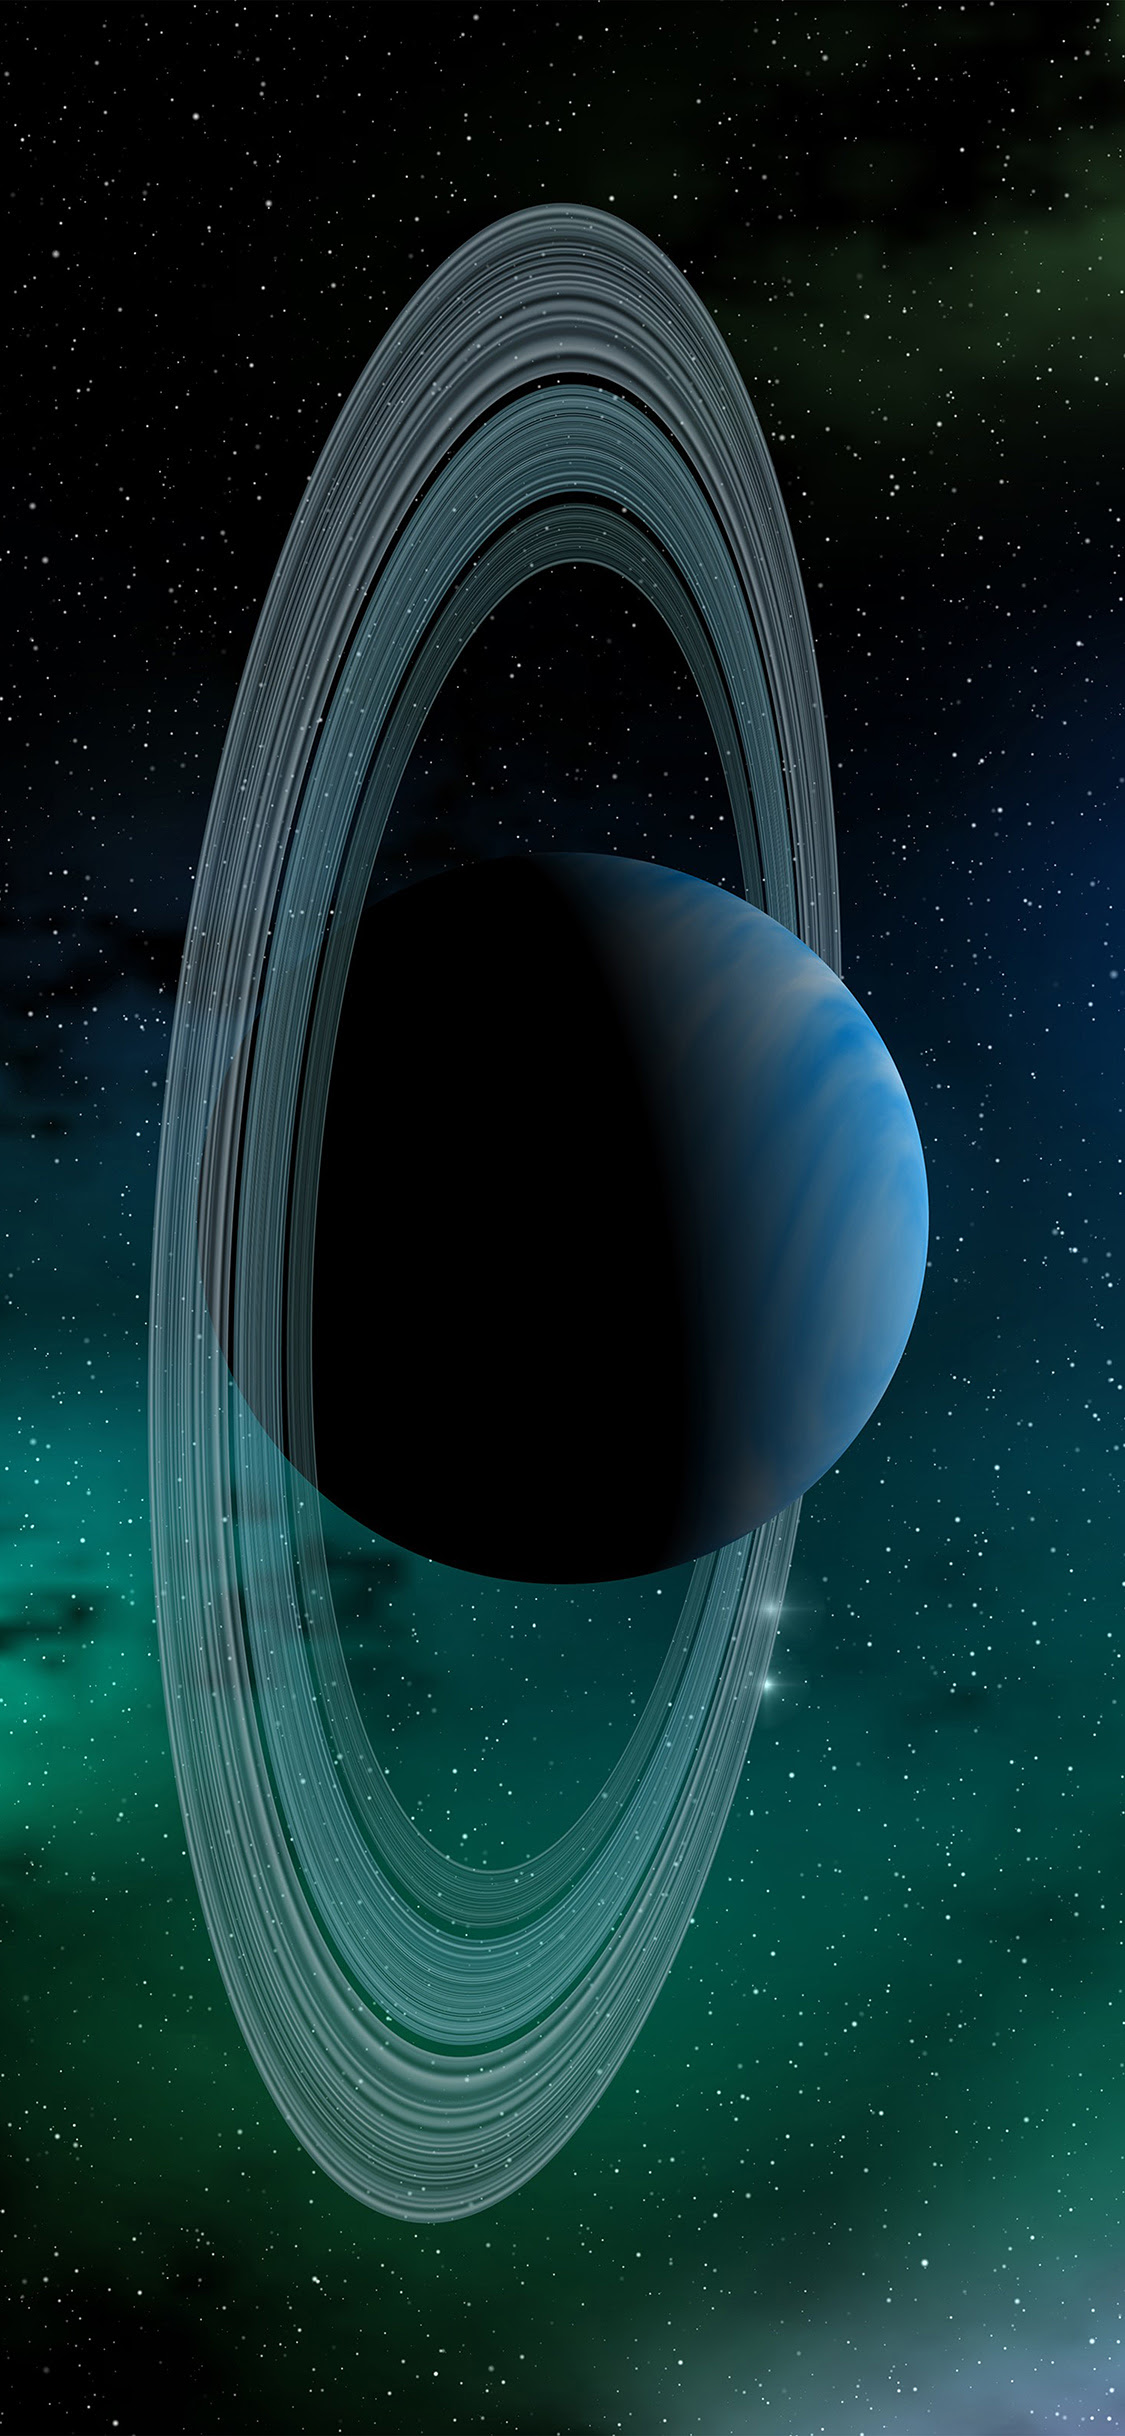 Download 58+ Wallpaper Iphone Planet Gambar HD Paling Keren